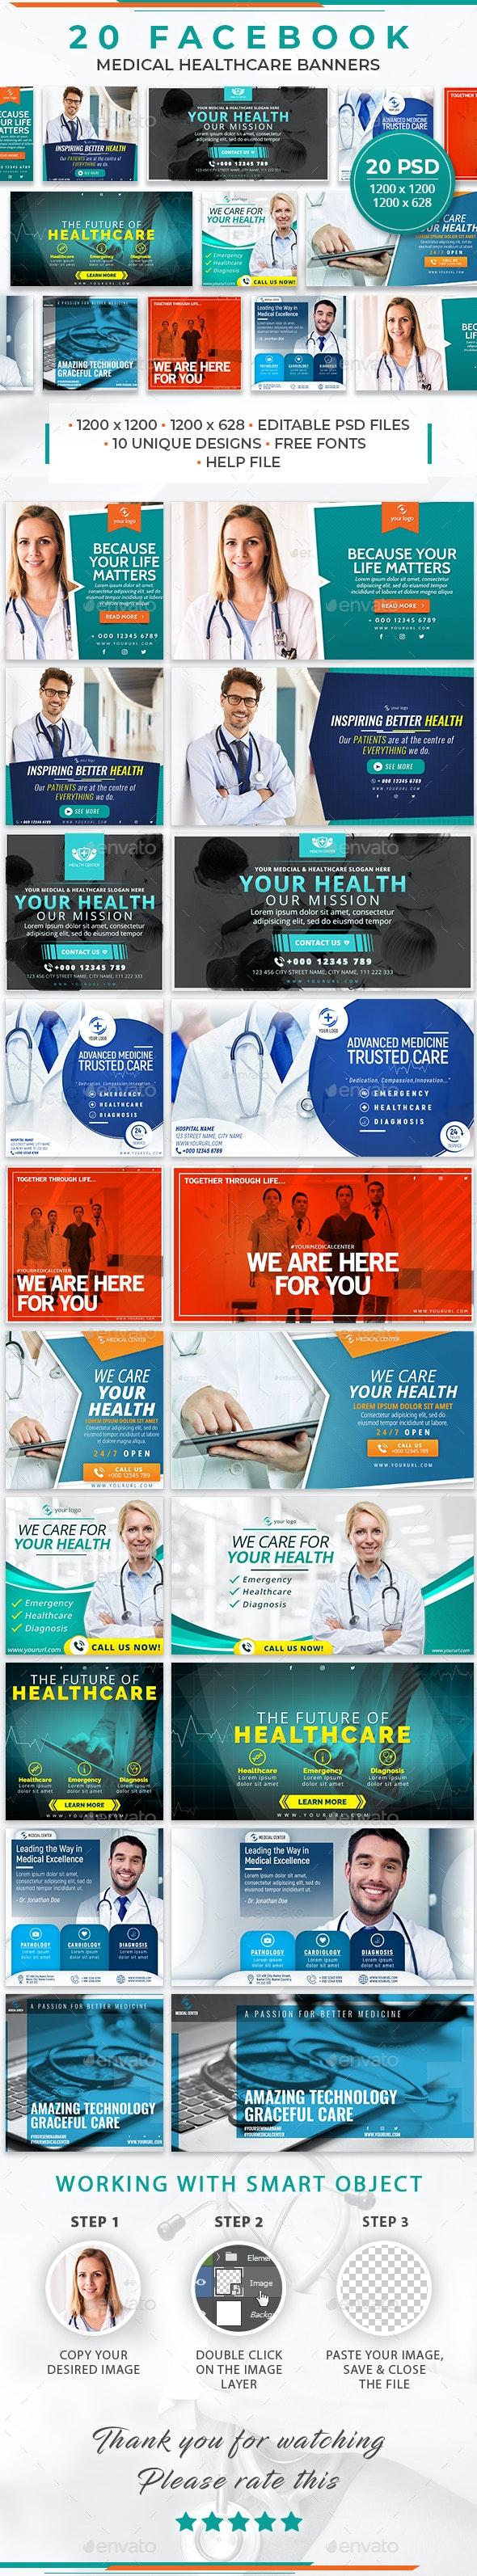 20 Facebook Medical Healthcare Banners - Social Media Web Elements